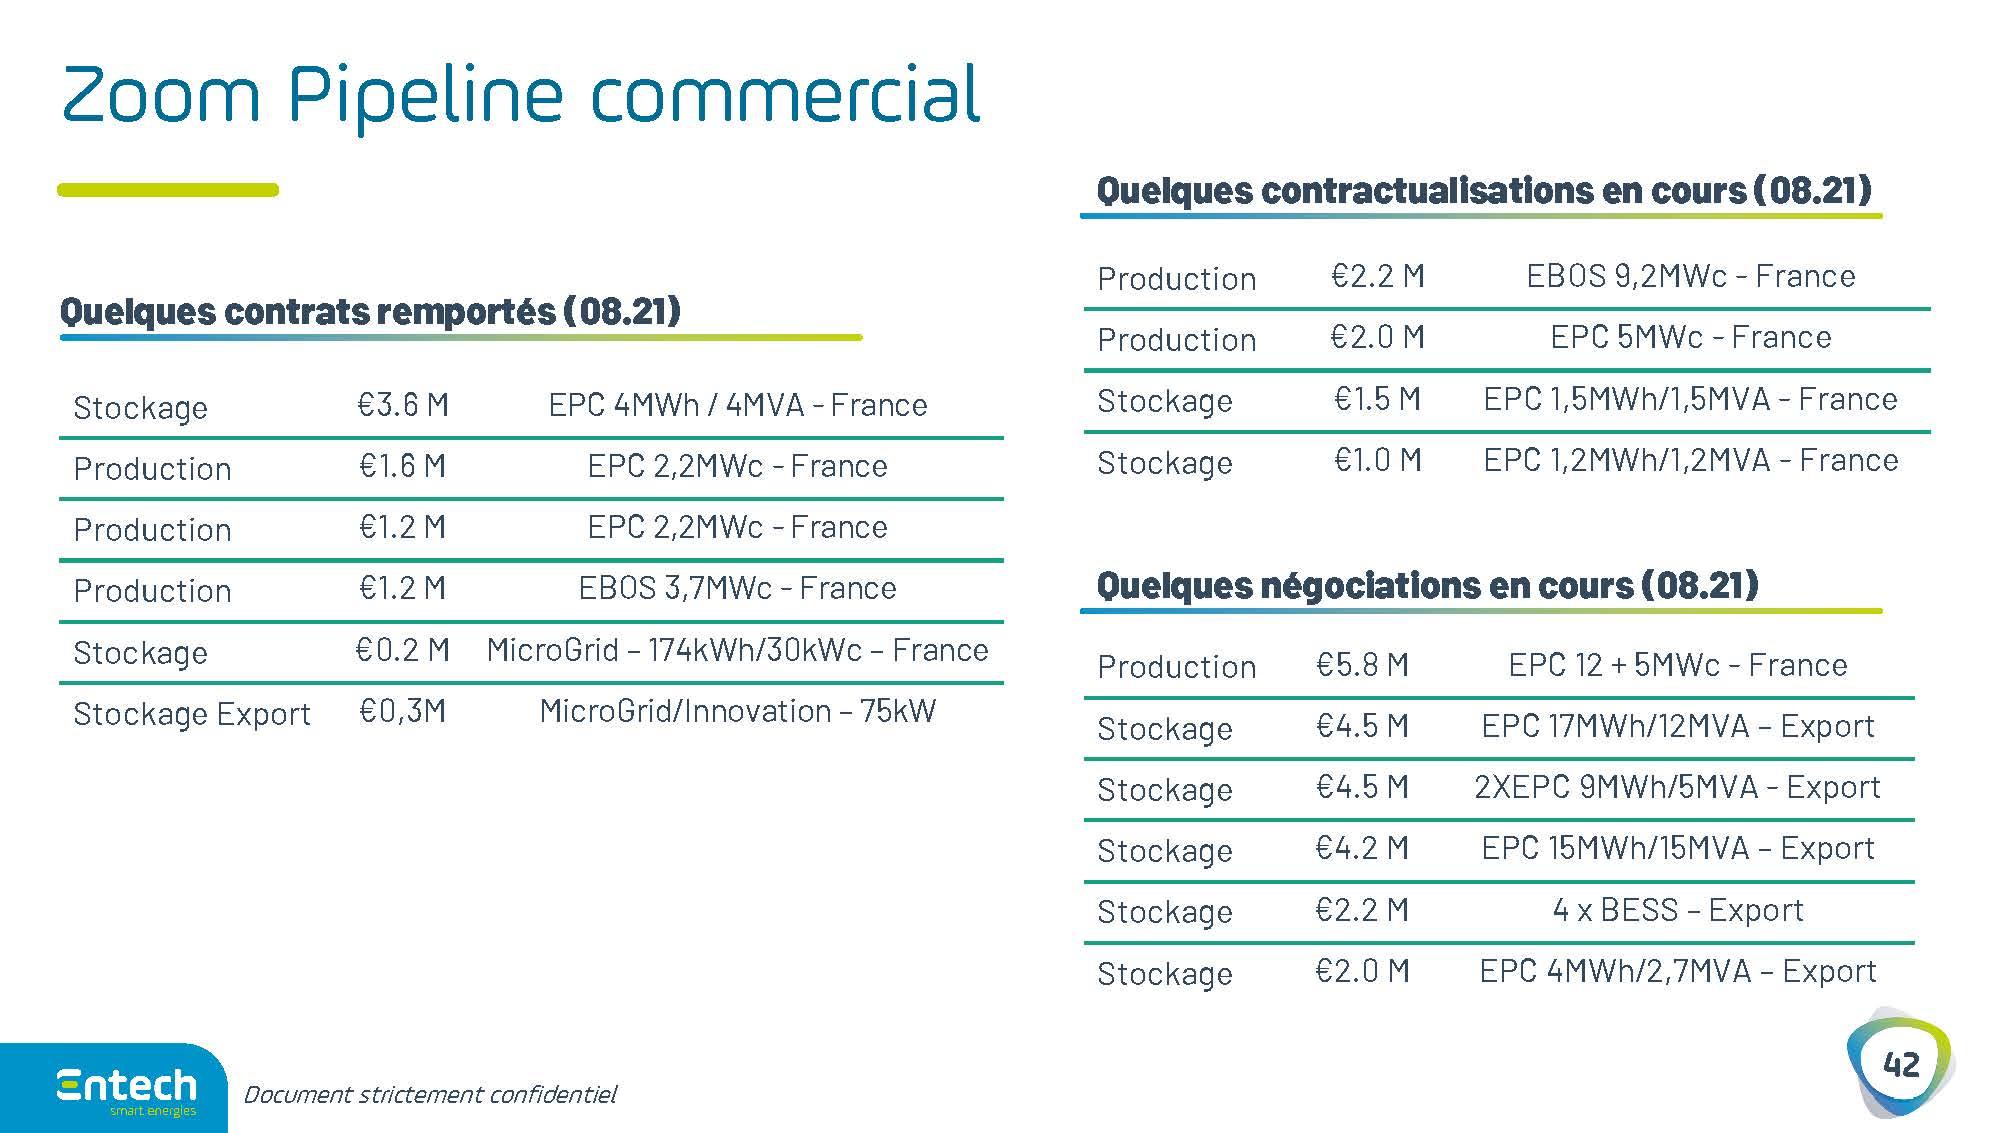 ENTECH_PRES_IPO_210914_FR_Page_42